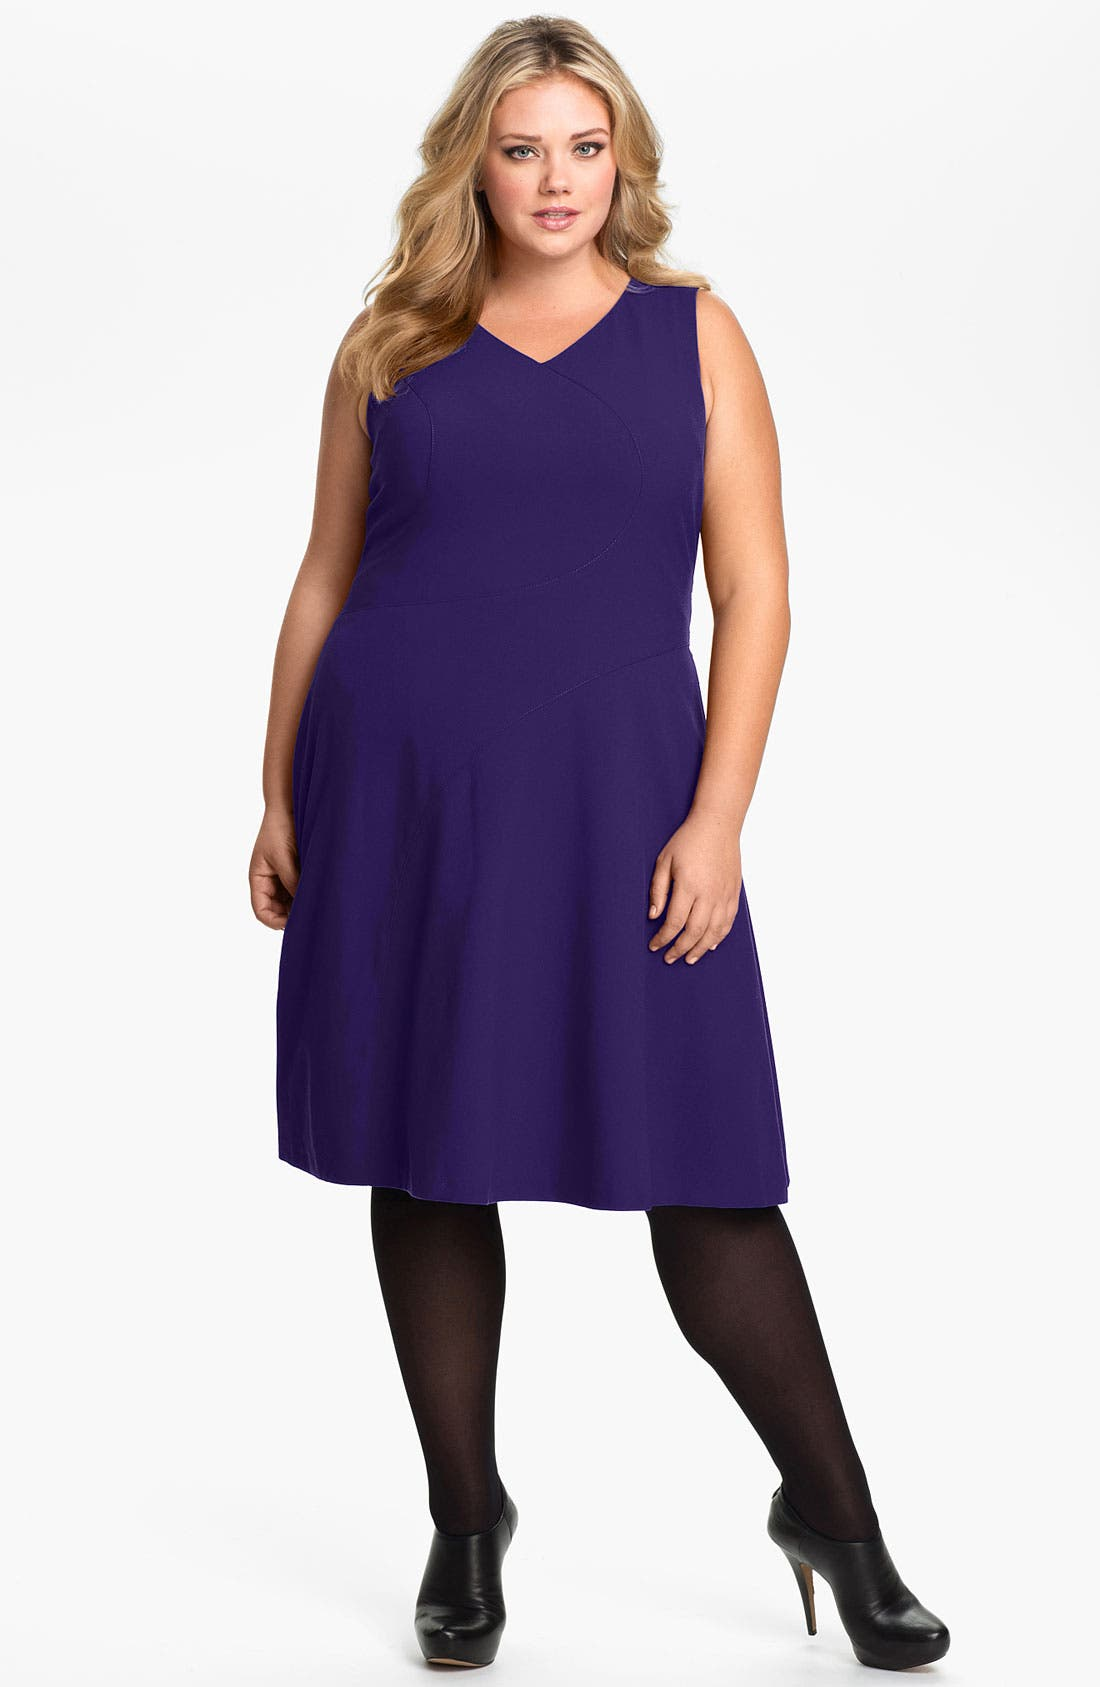 Alternate Image 1 Selected - Calvin Klein Sleeveless A-Line Jersey Dress (Plus)